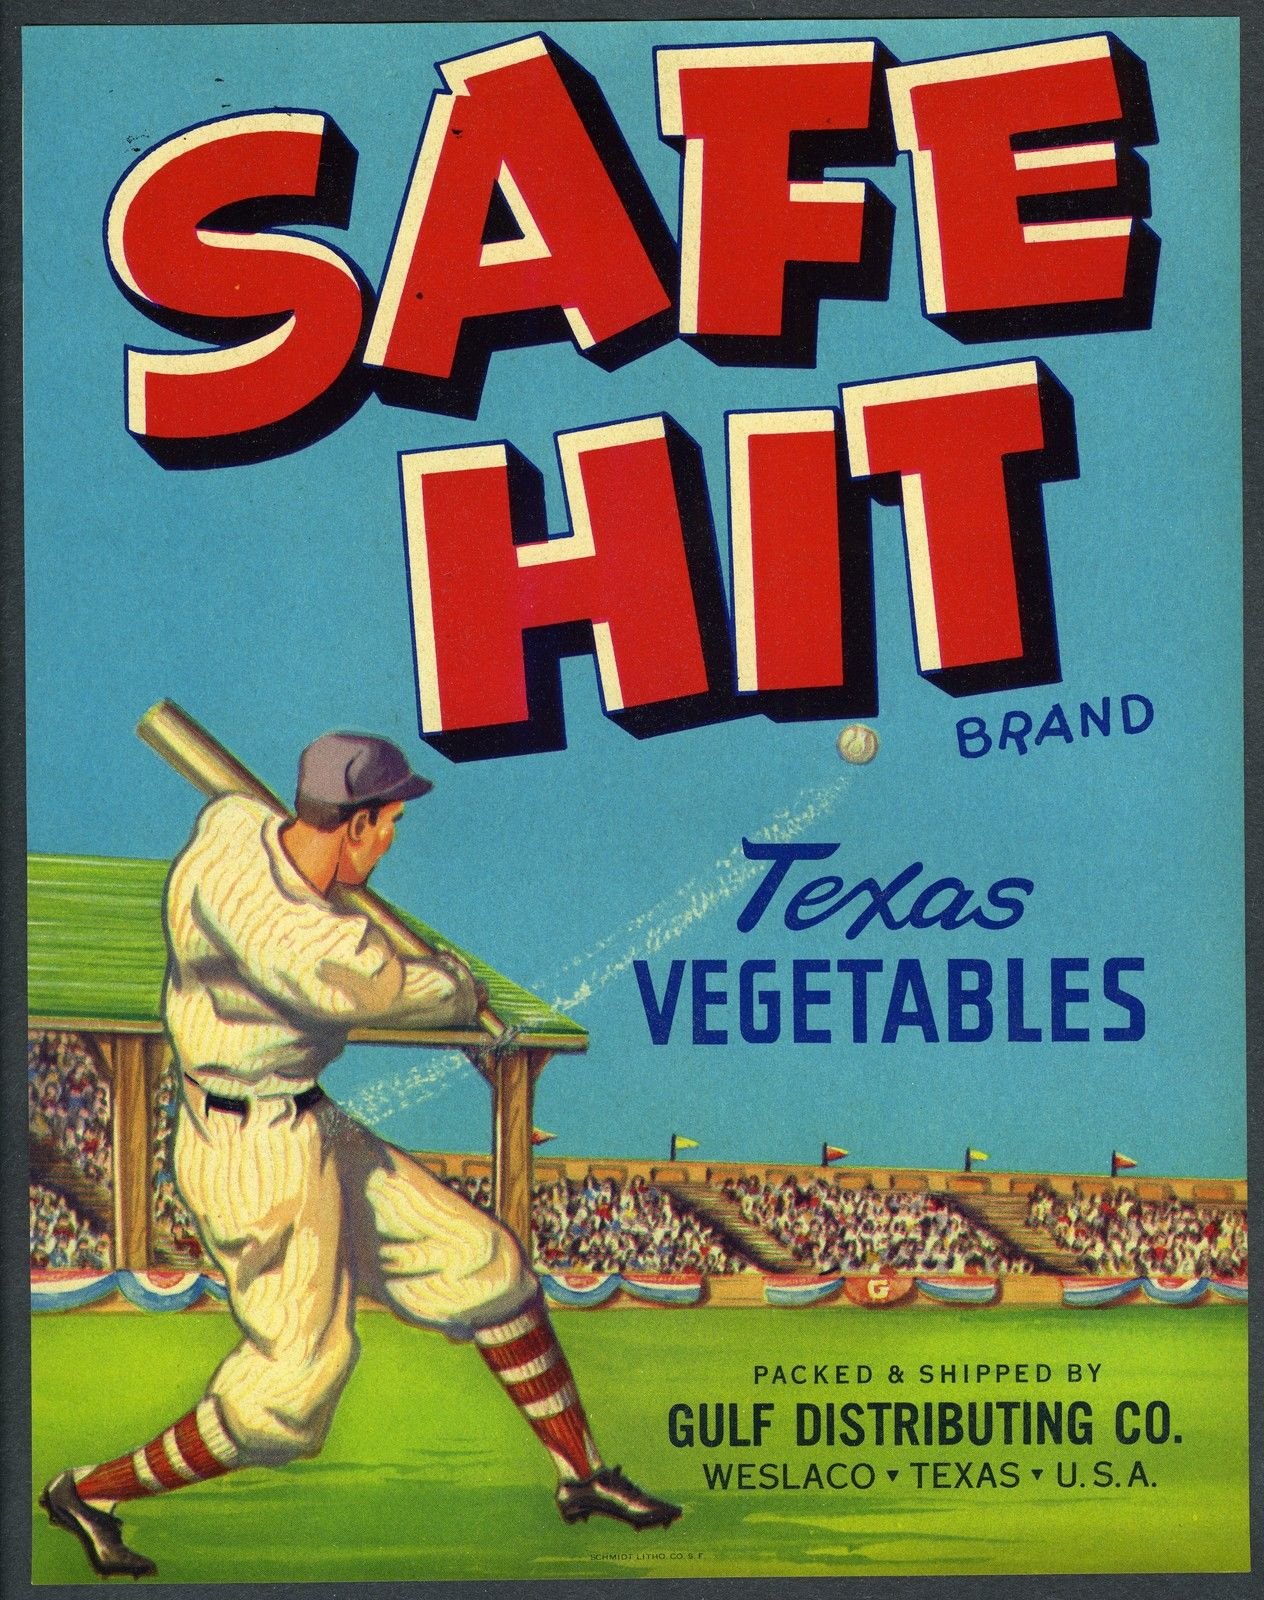 American veg label